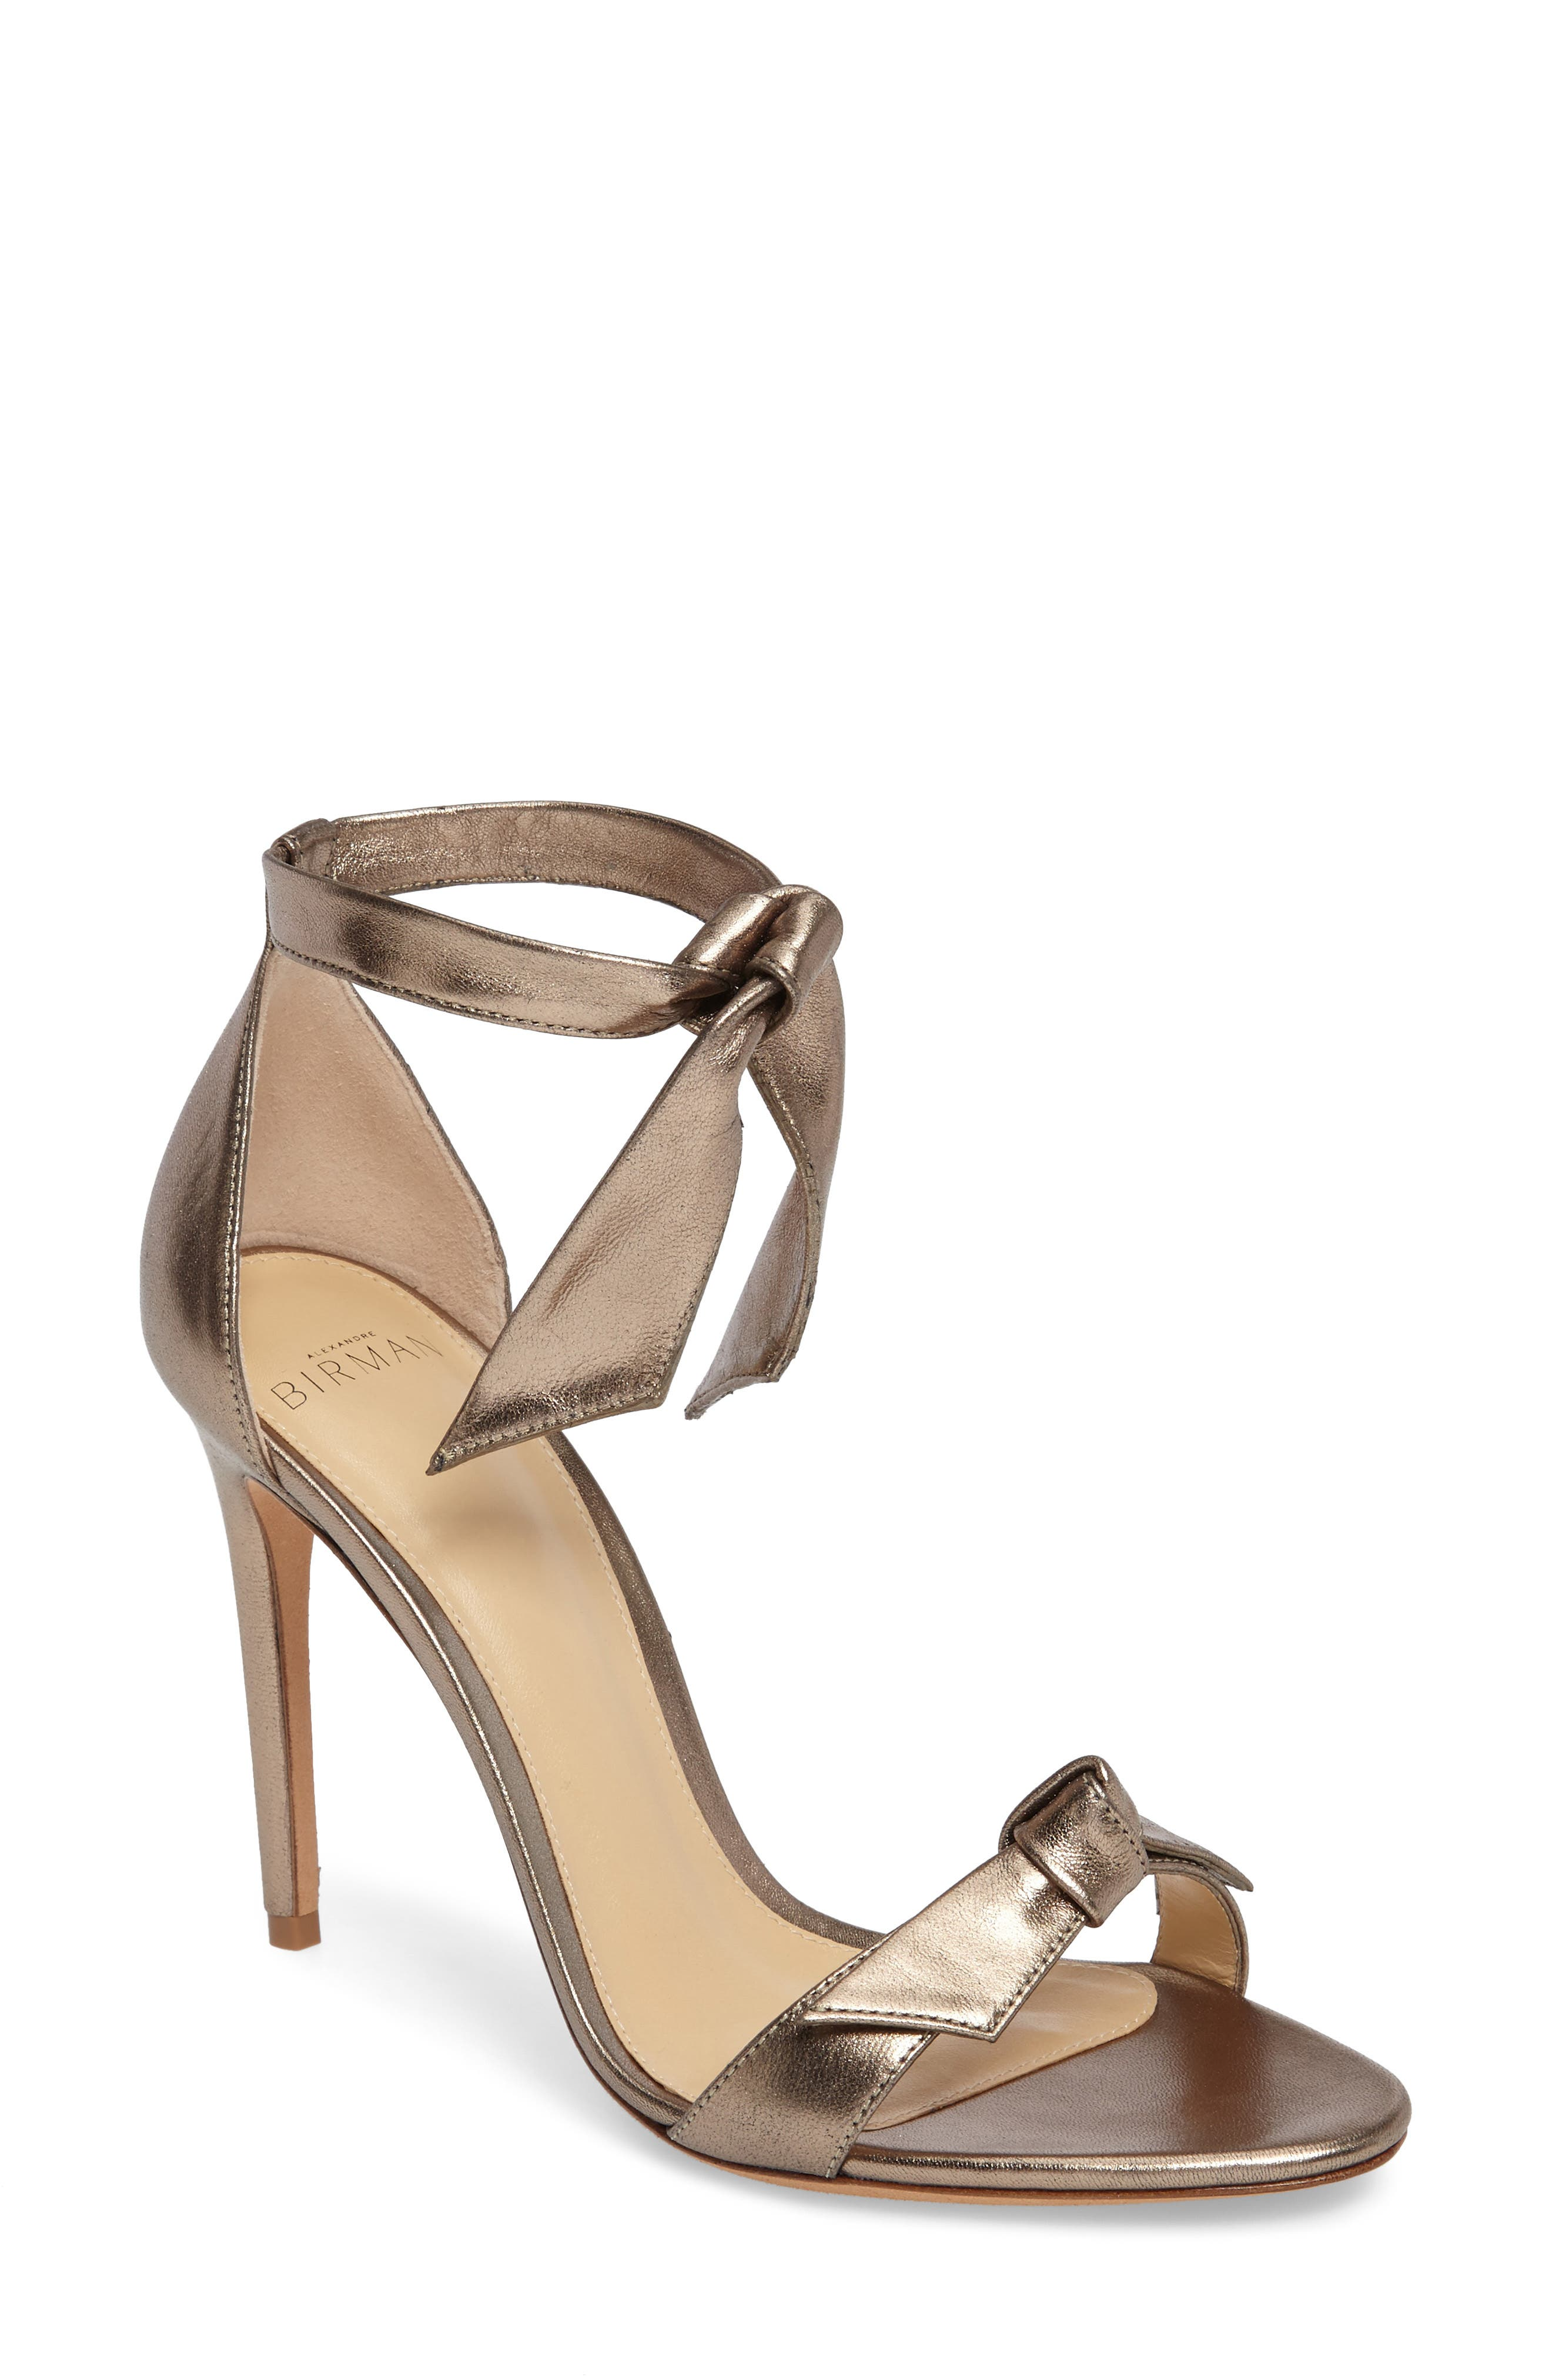 Clarita Ankle Tie Sandal,                         Main,                         color, METALLIC GOLD LEATHER